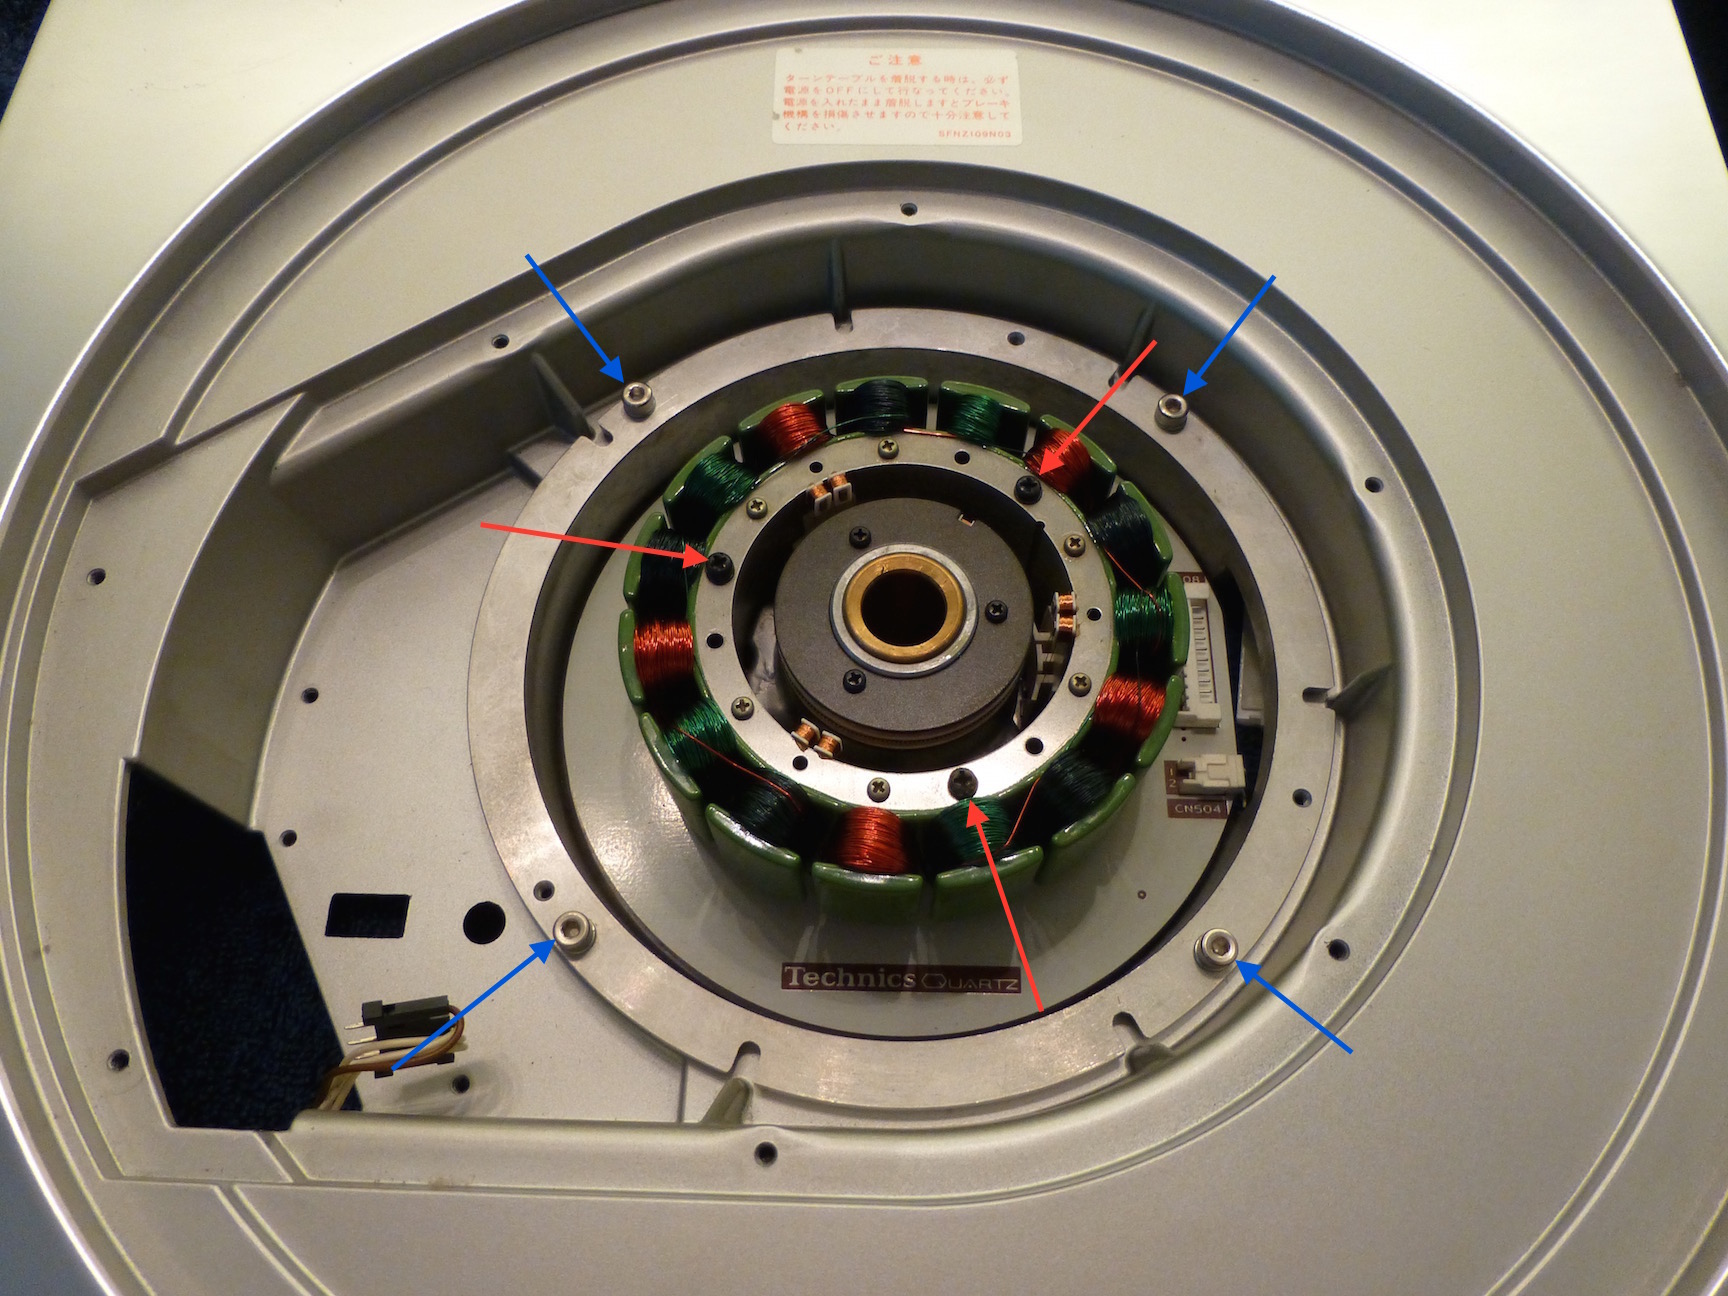 The Incredible Technics SP-10 MK3 Thread-p1010521-jpg